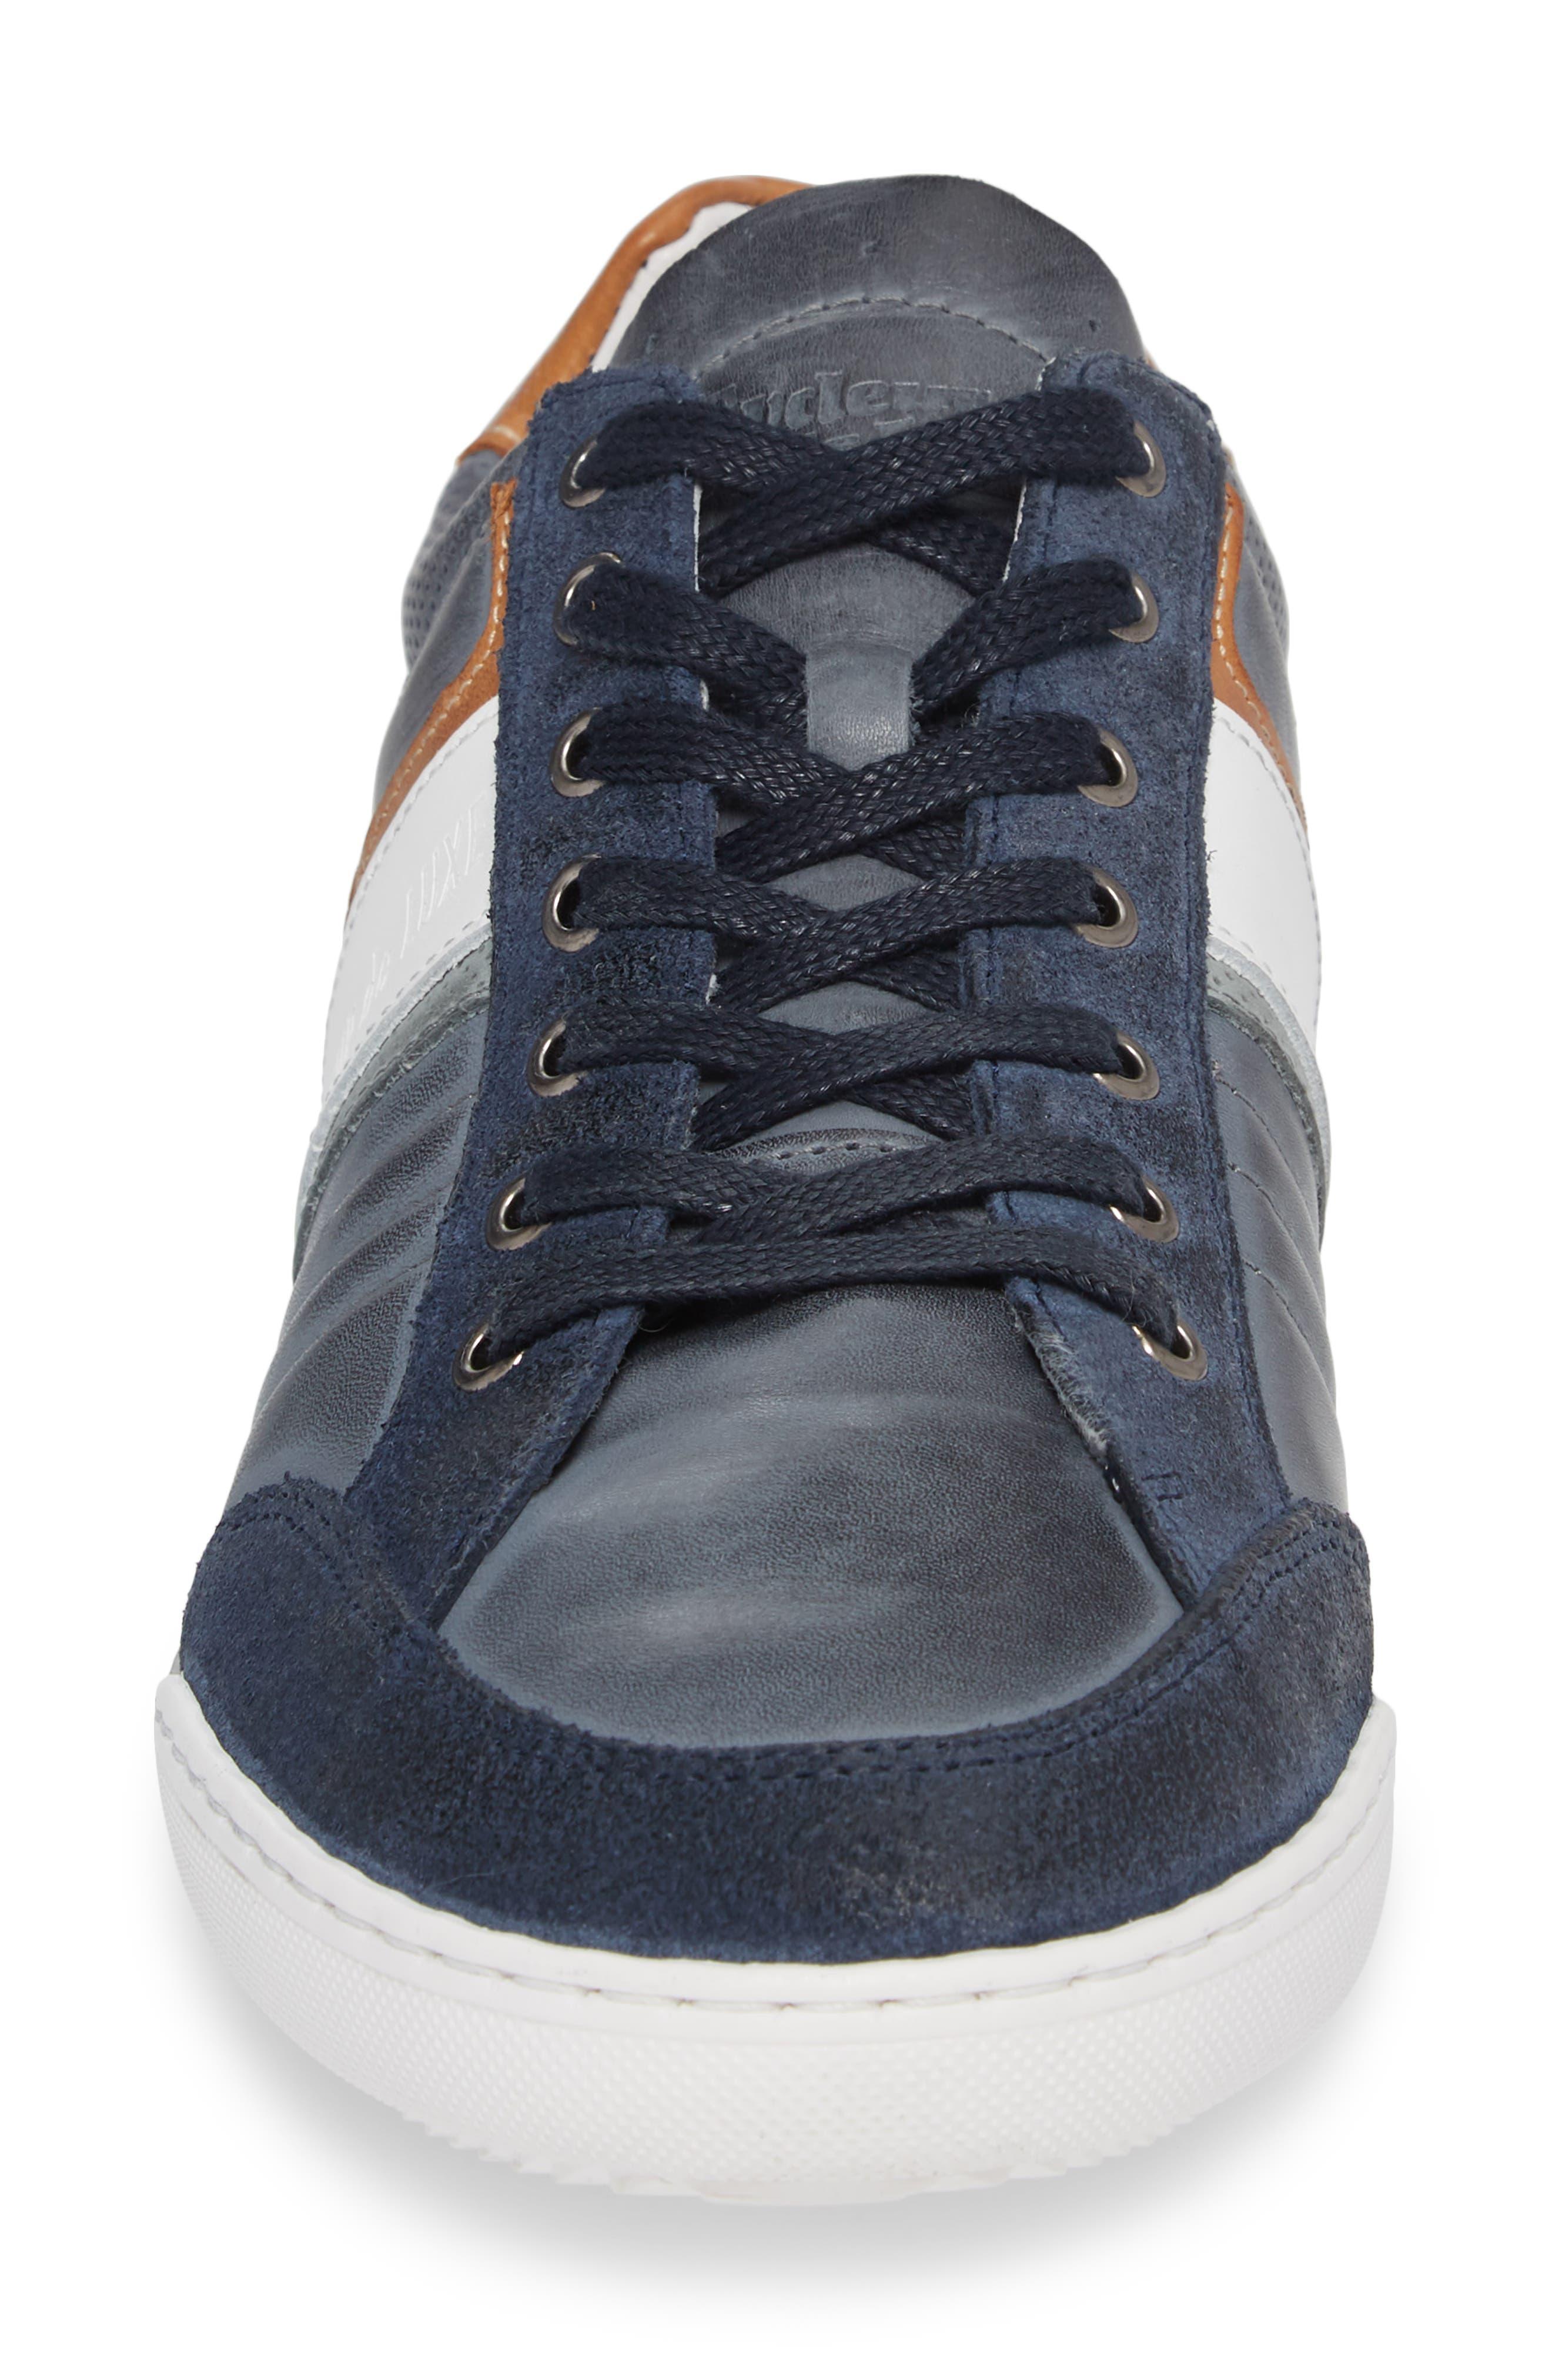 Solo Low Top Sneaker,                             Alternate thumbnail 4, color,                             Denim/ White/ Cognac Leather